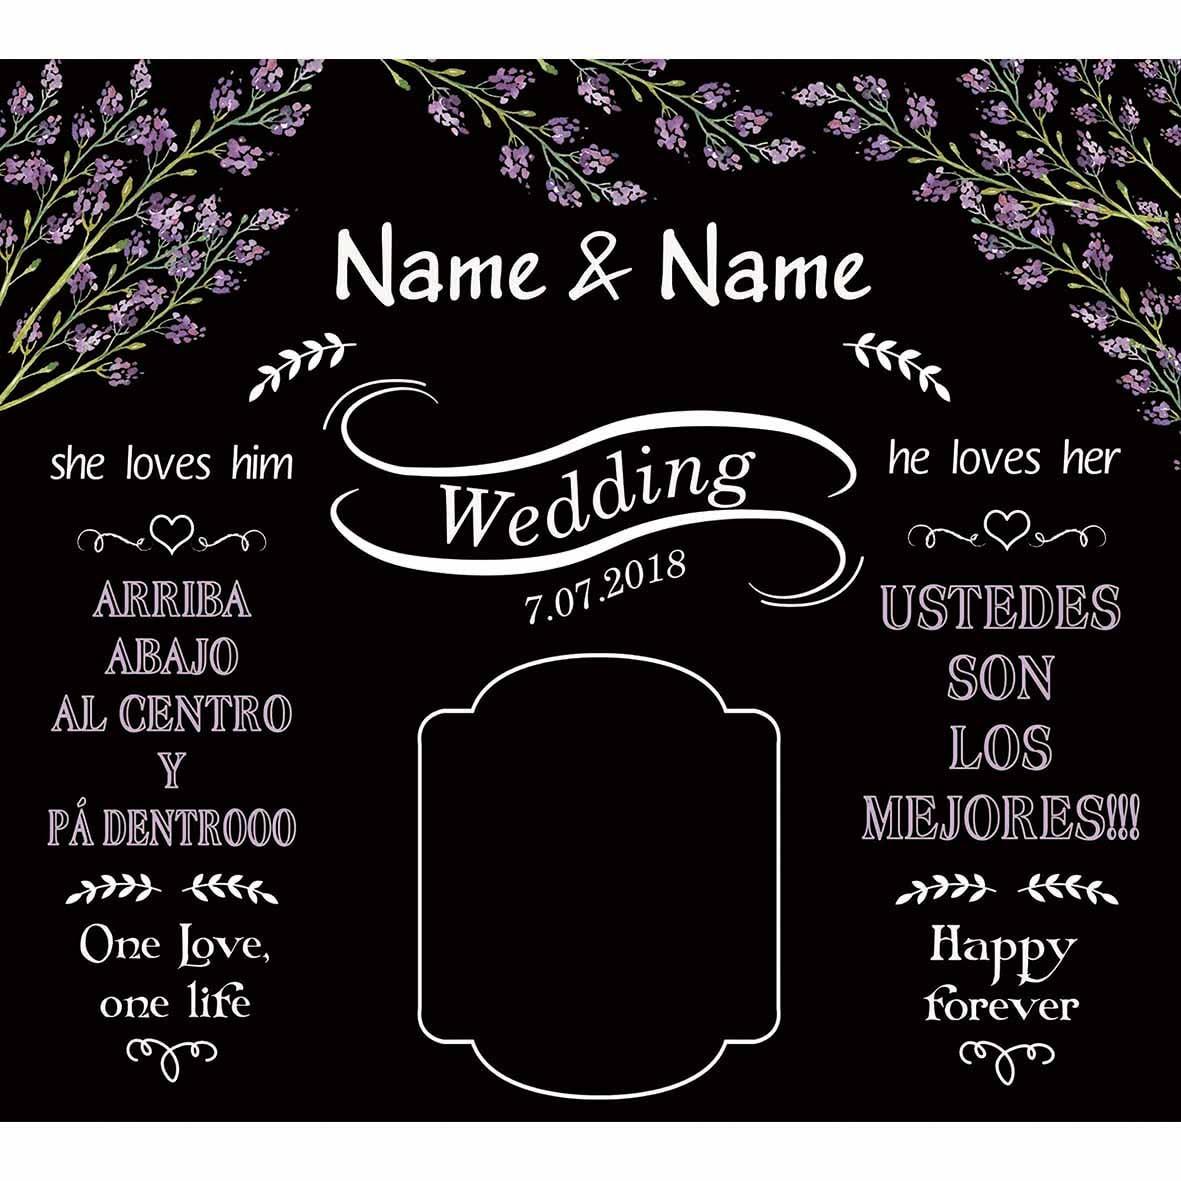 Us 9 86 29 Off Funnytree Photography Backdrop Photocall Custom Wedding Black White Lavender Hearts Romantic Celebration Photographer Background In